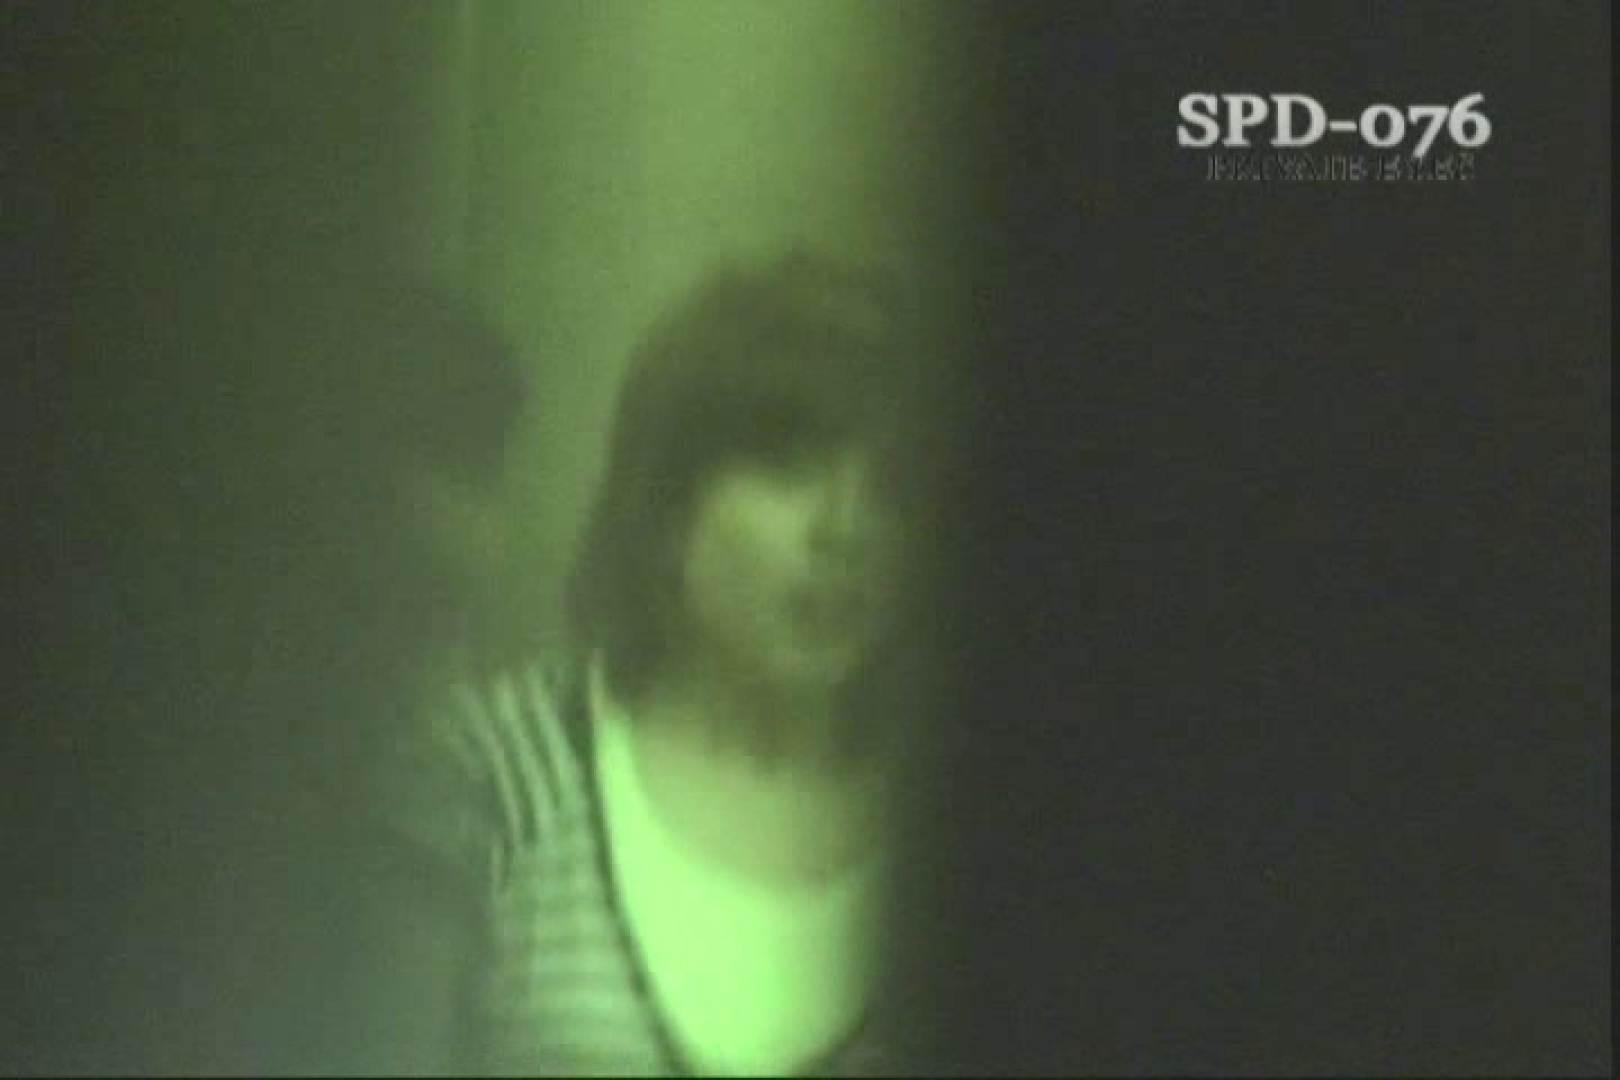 高画質版!SPD-076 盗撮・厠の隙間 1 高画質 盗撮戯れ無修正画像 70画像 48